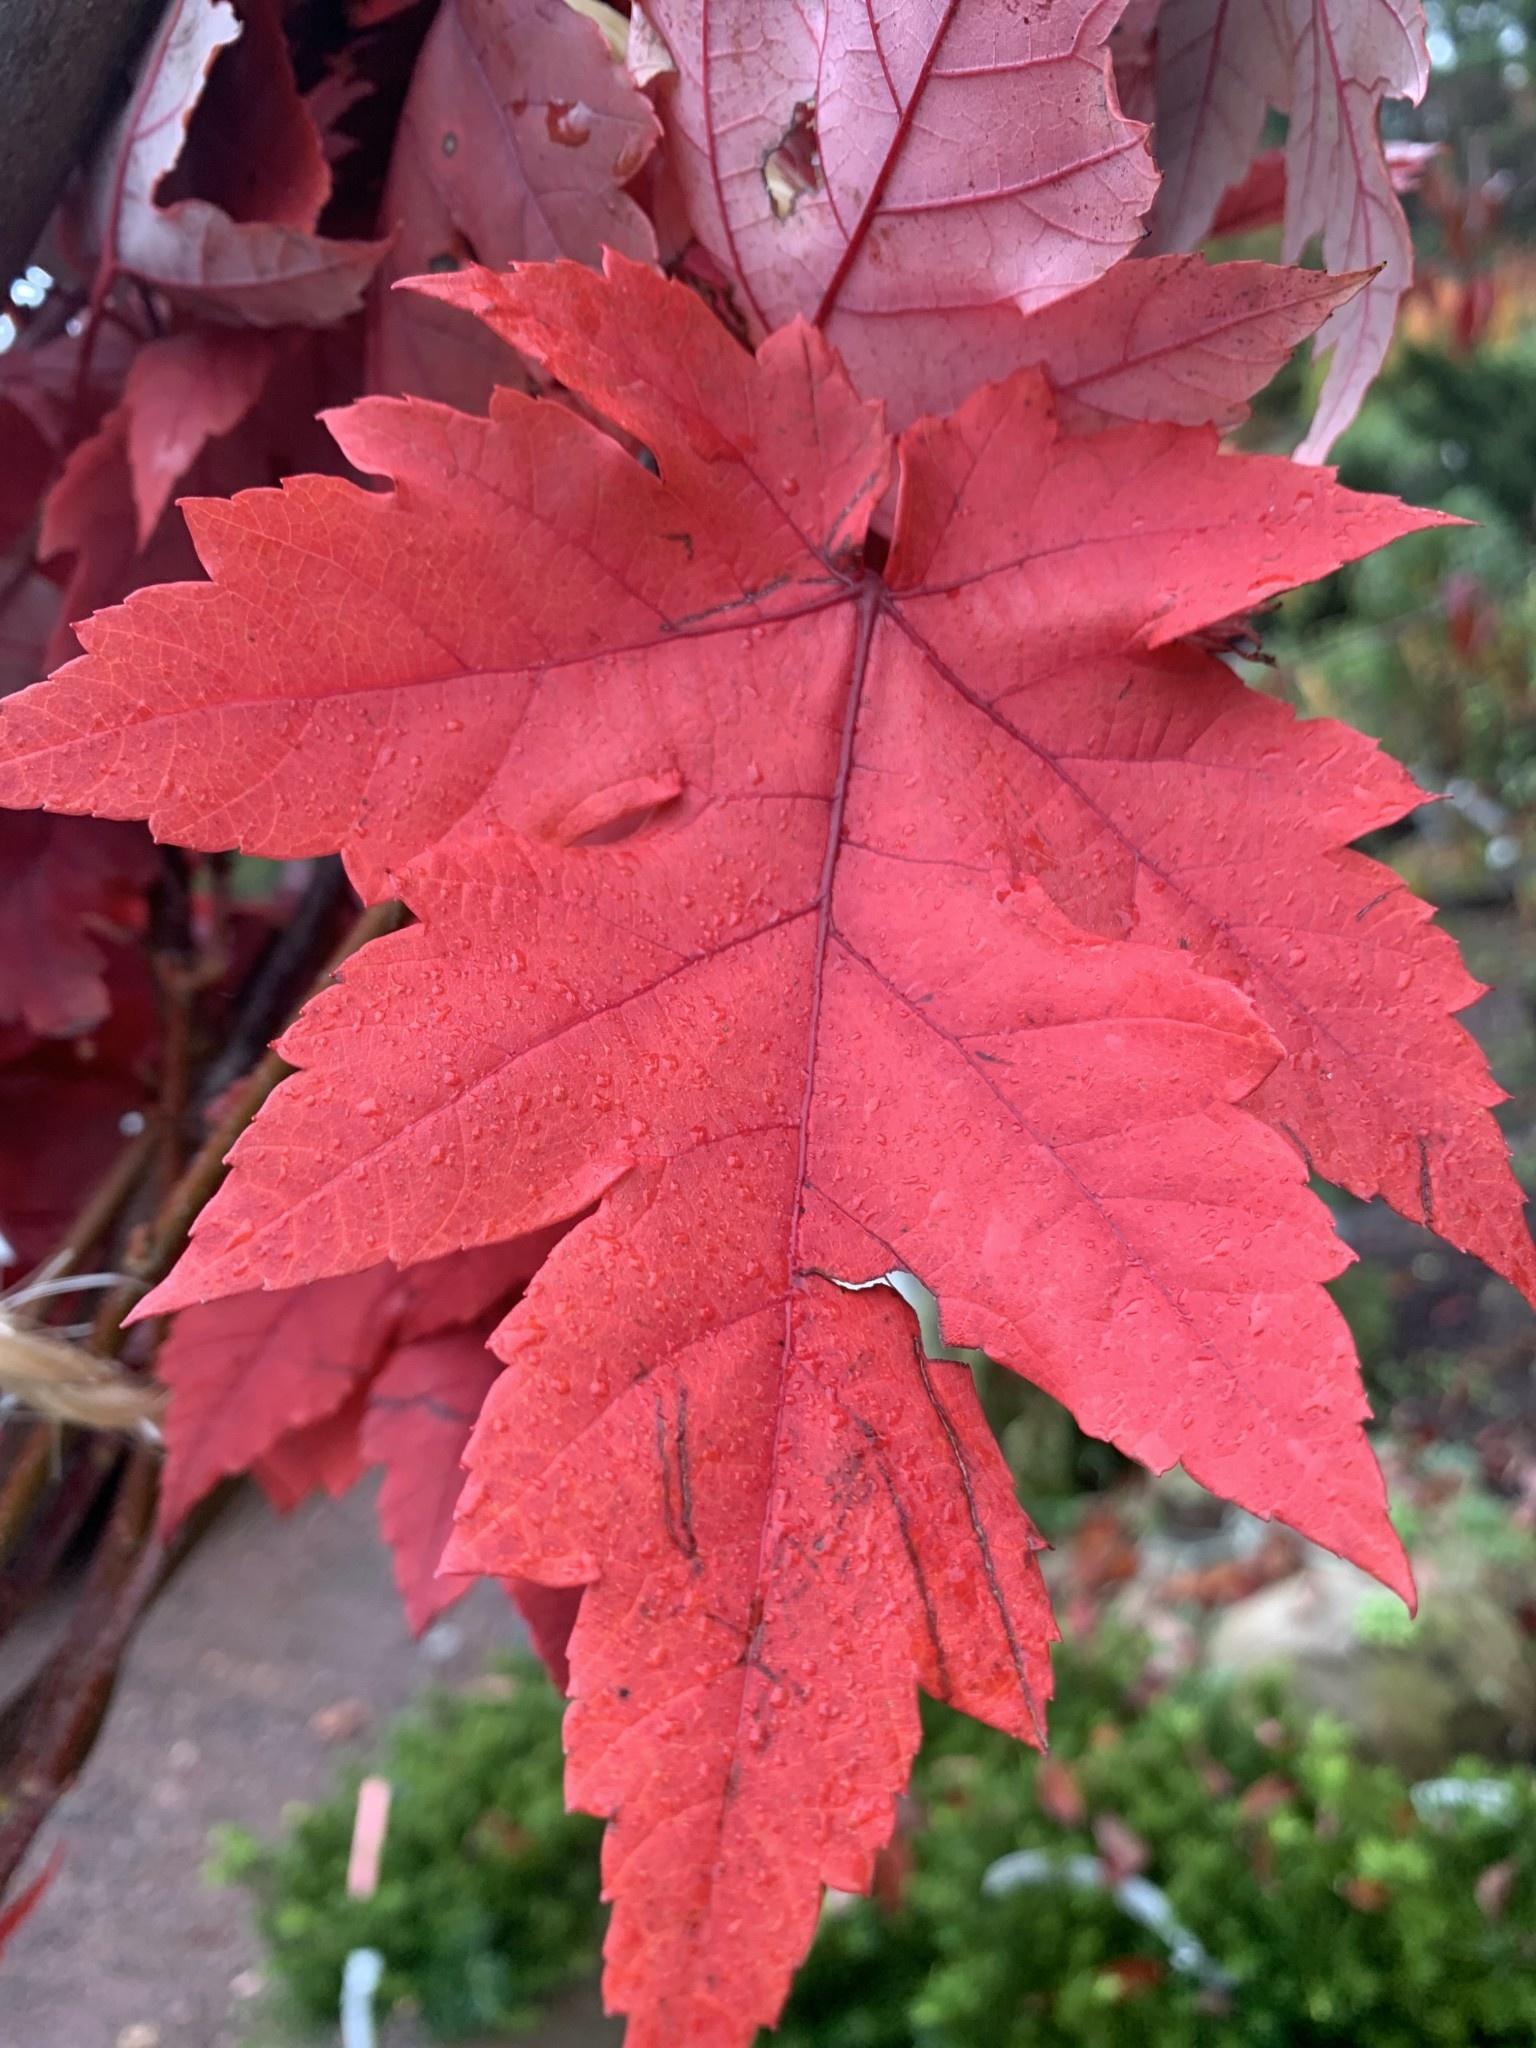 Acer x freemanii Jeffersred Maple - Freeman, Autumn Blaze, #15